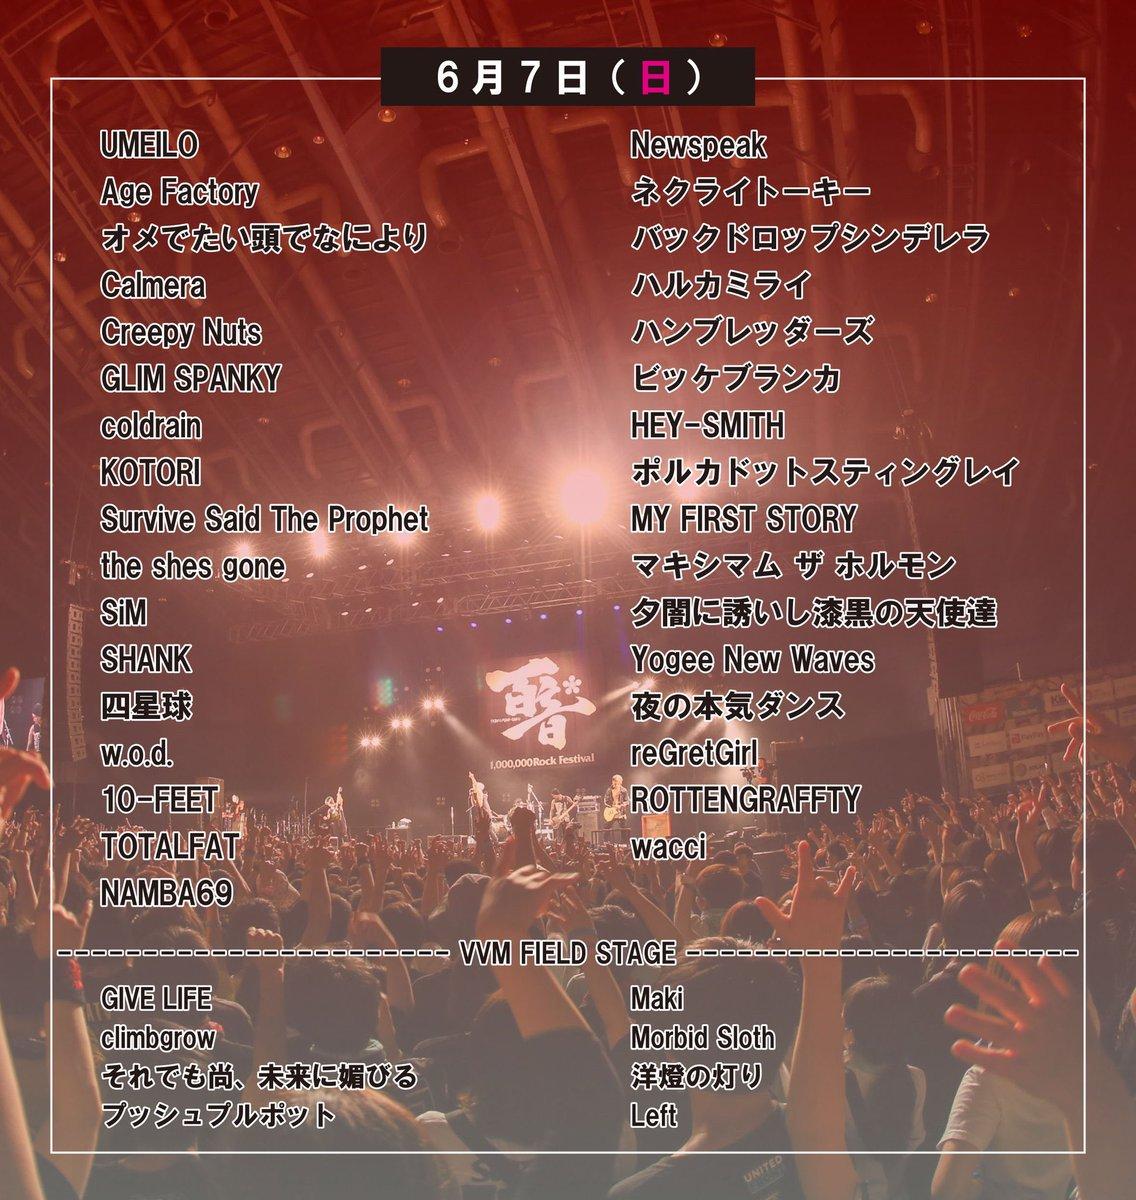 test ツイッターメディア - 【お知らせ】  2020年6/6(土),7(日) 石川県産業展示館1~4号館で開催される  百万石音楽祭2020 ~ミリオンロックフェスティバル~に出演決定! ※MY FIRST STORYの出演日は6/7(日)となります。  ▼オフィシャルHP  https://t.co/iJWQbQnPuG 【チケット先着先行受付中!】 https://t.co/akJjIbhmH7